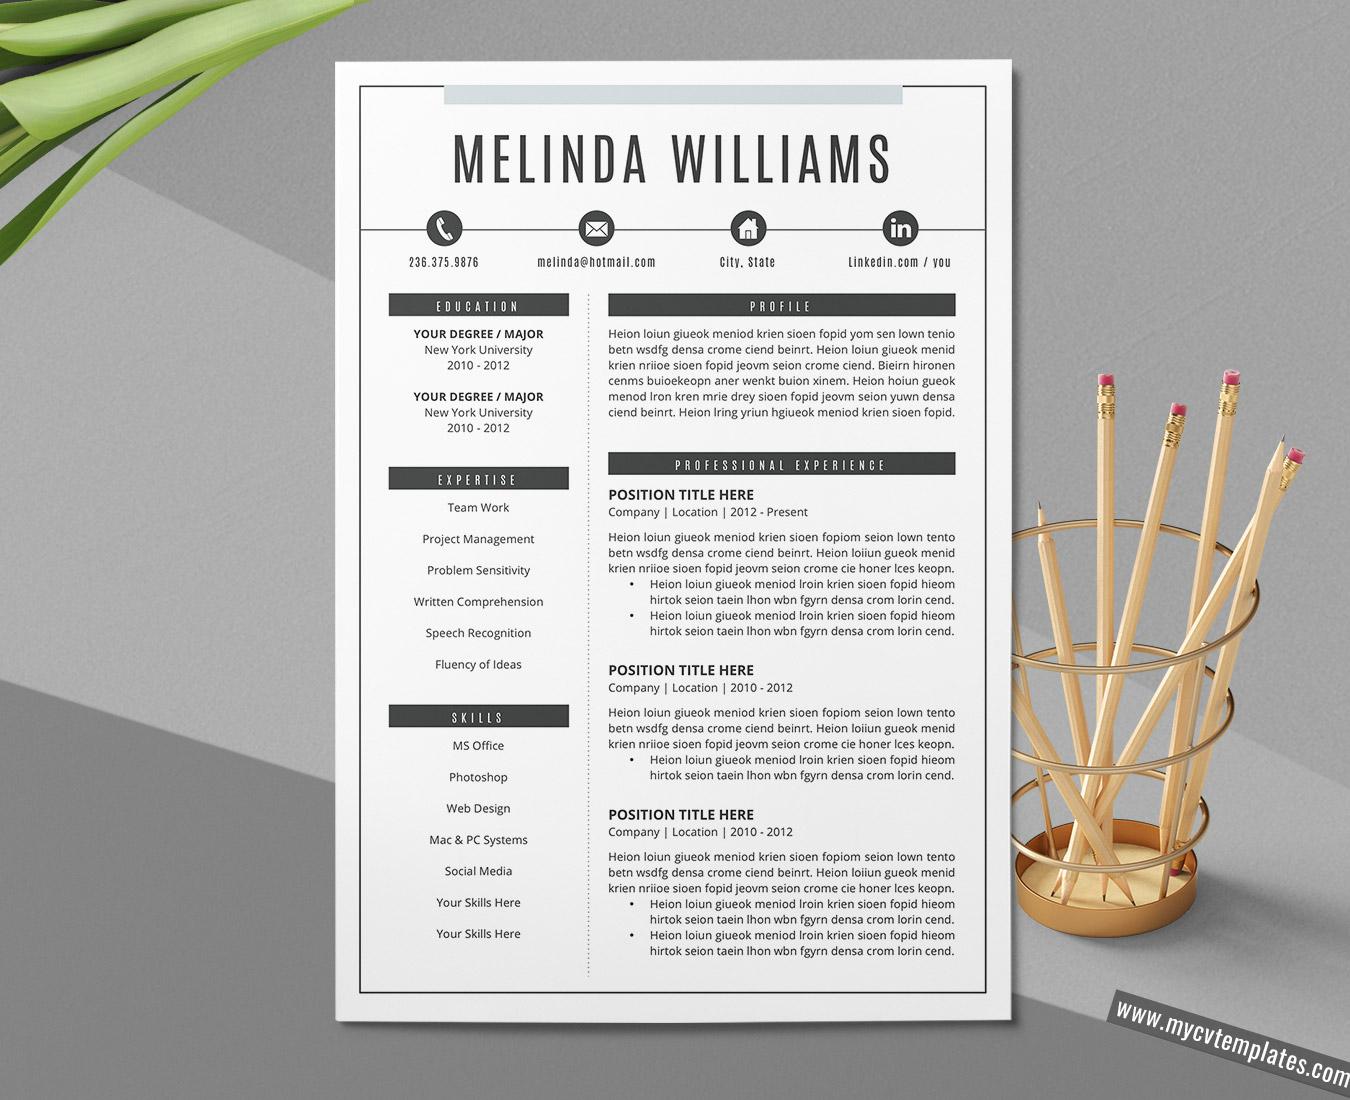 Professional CV Template for Word, Curriculum Vitae, Simple CV Format  Design, Modern Resume Template, Creative Resume Format, Editable Resume,  300 30 ...